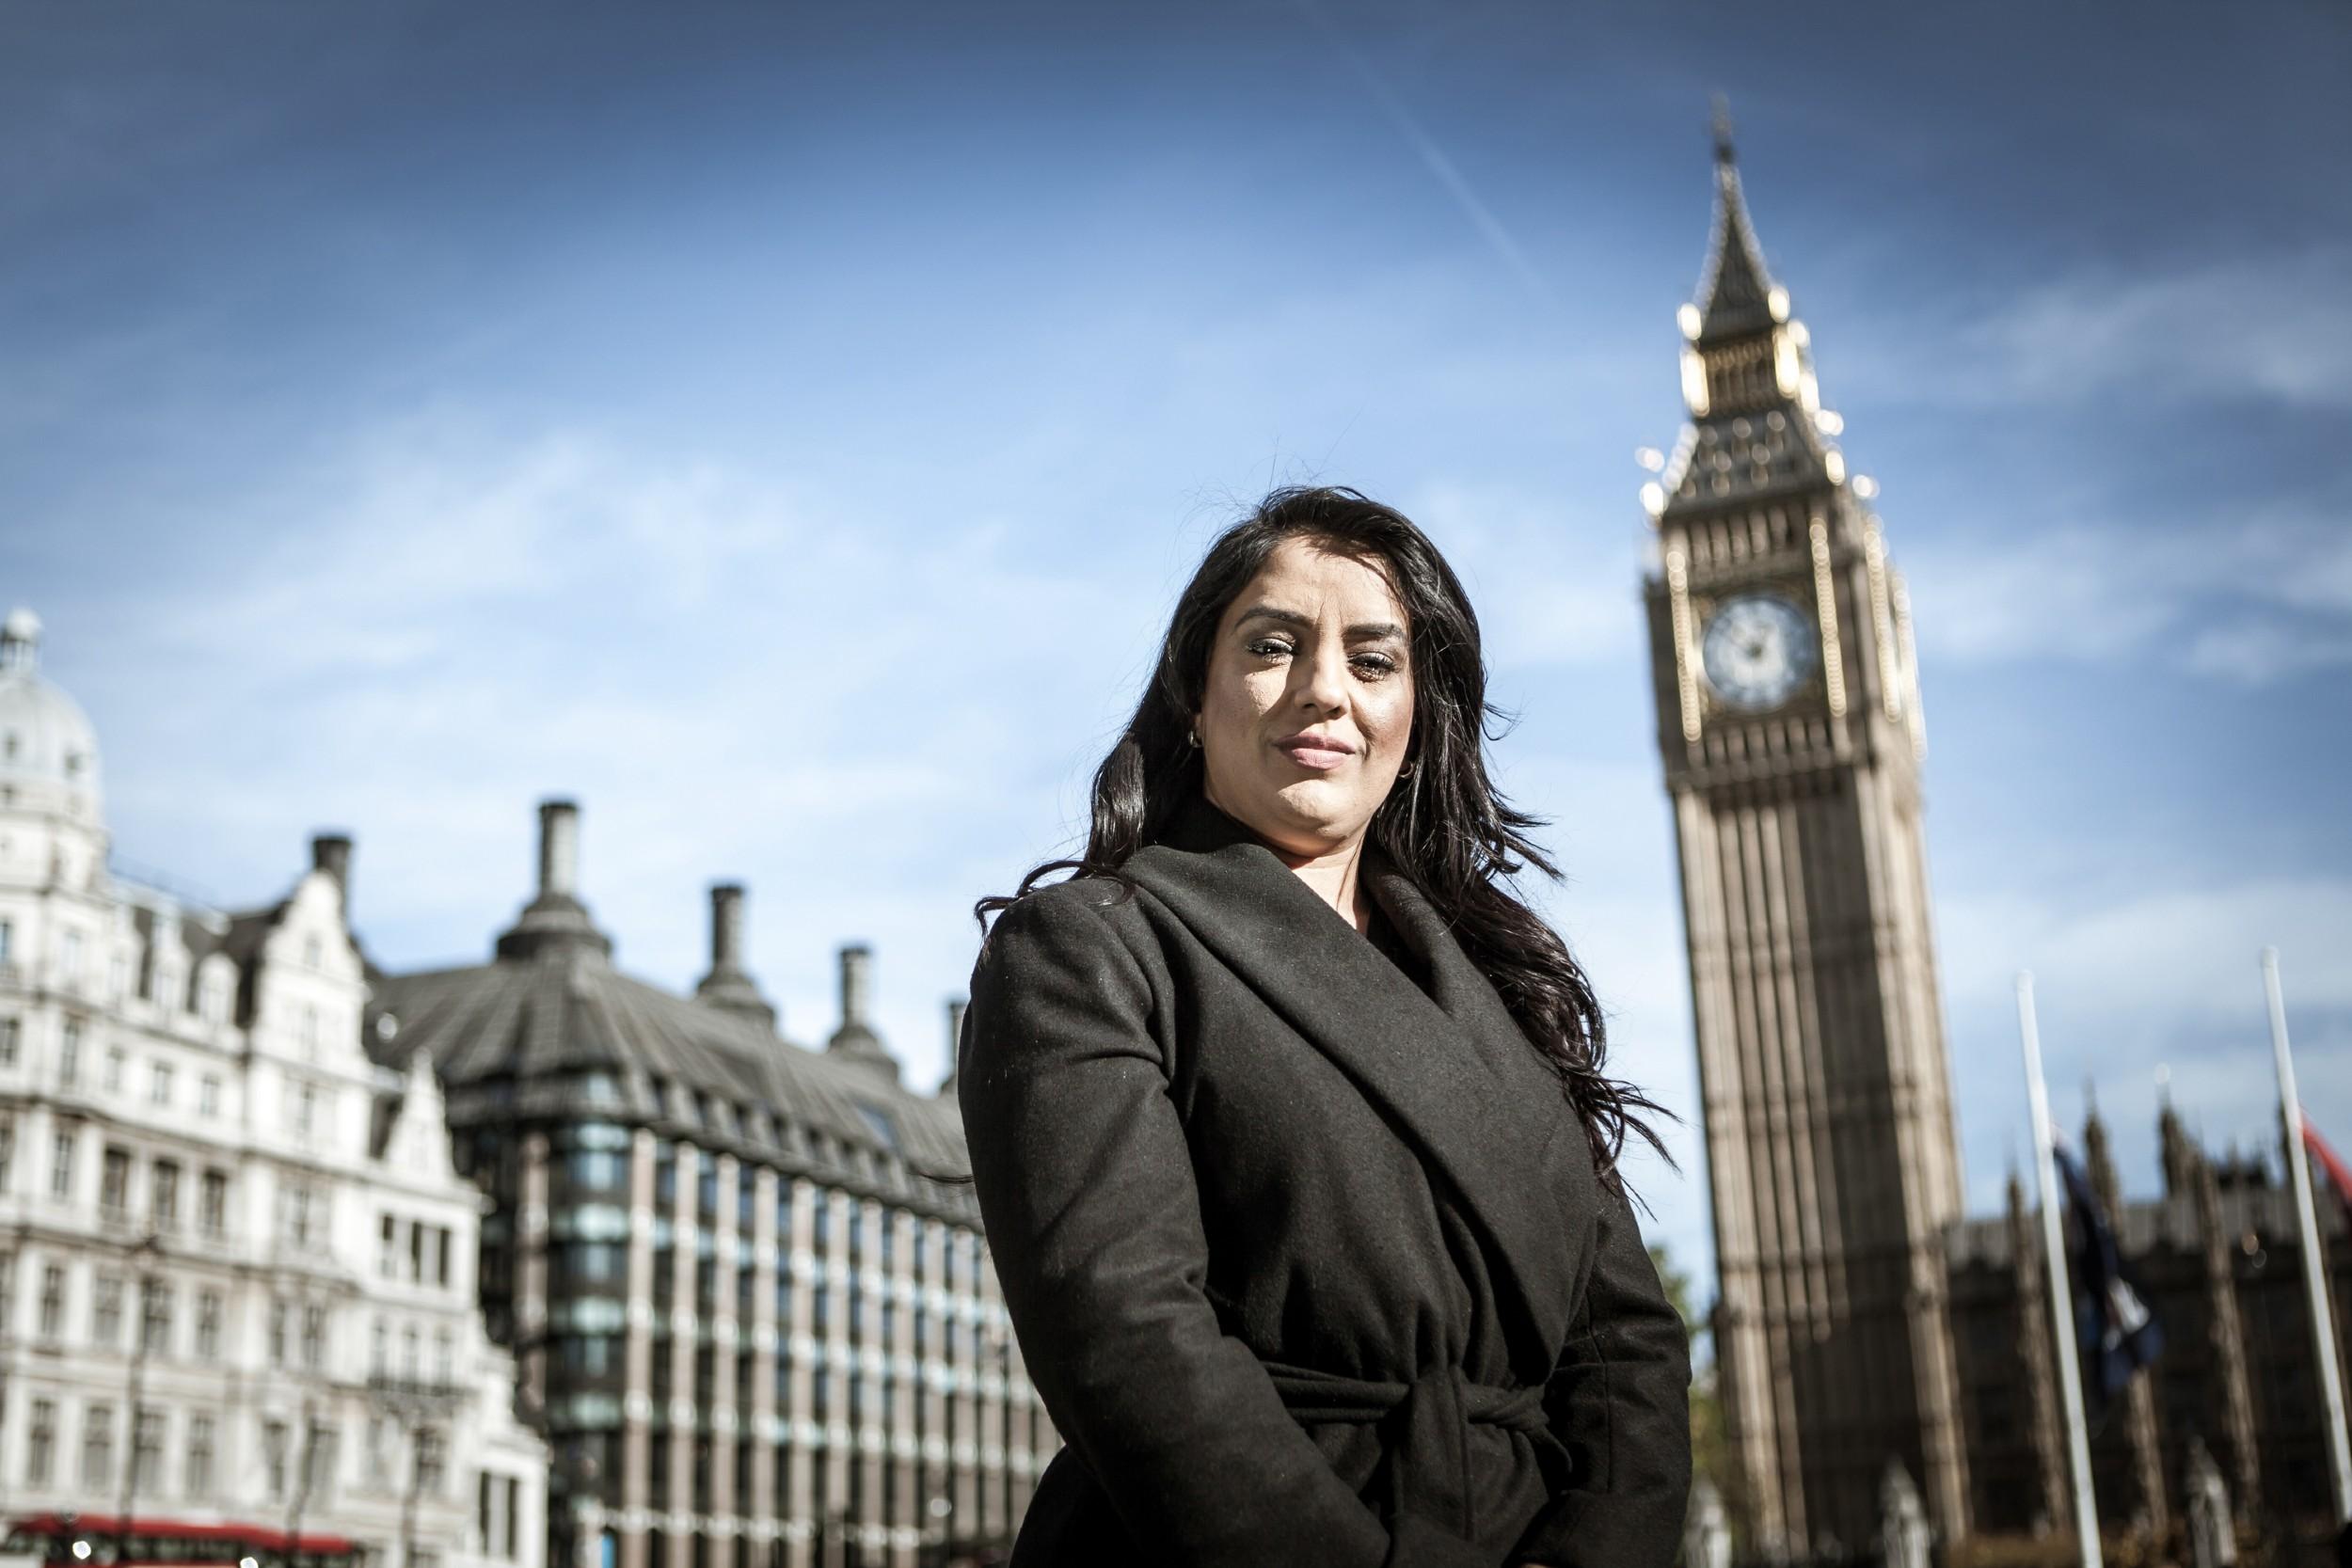 Naz Šah pozira ispred britanskog parlamenta i Big Bena (Foto: Sundog Pictures)